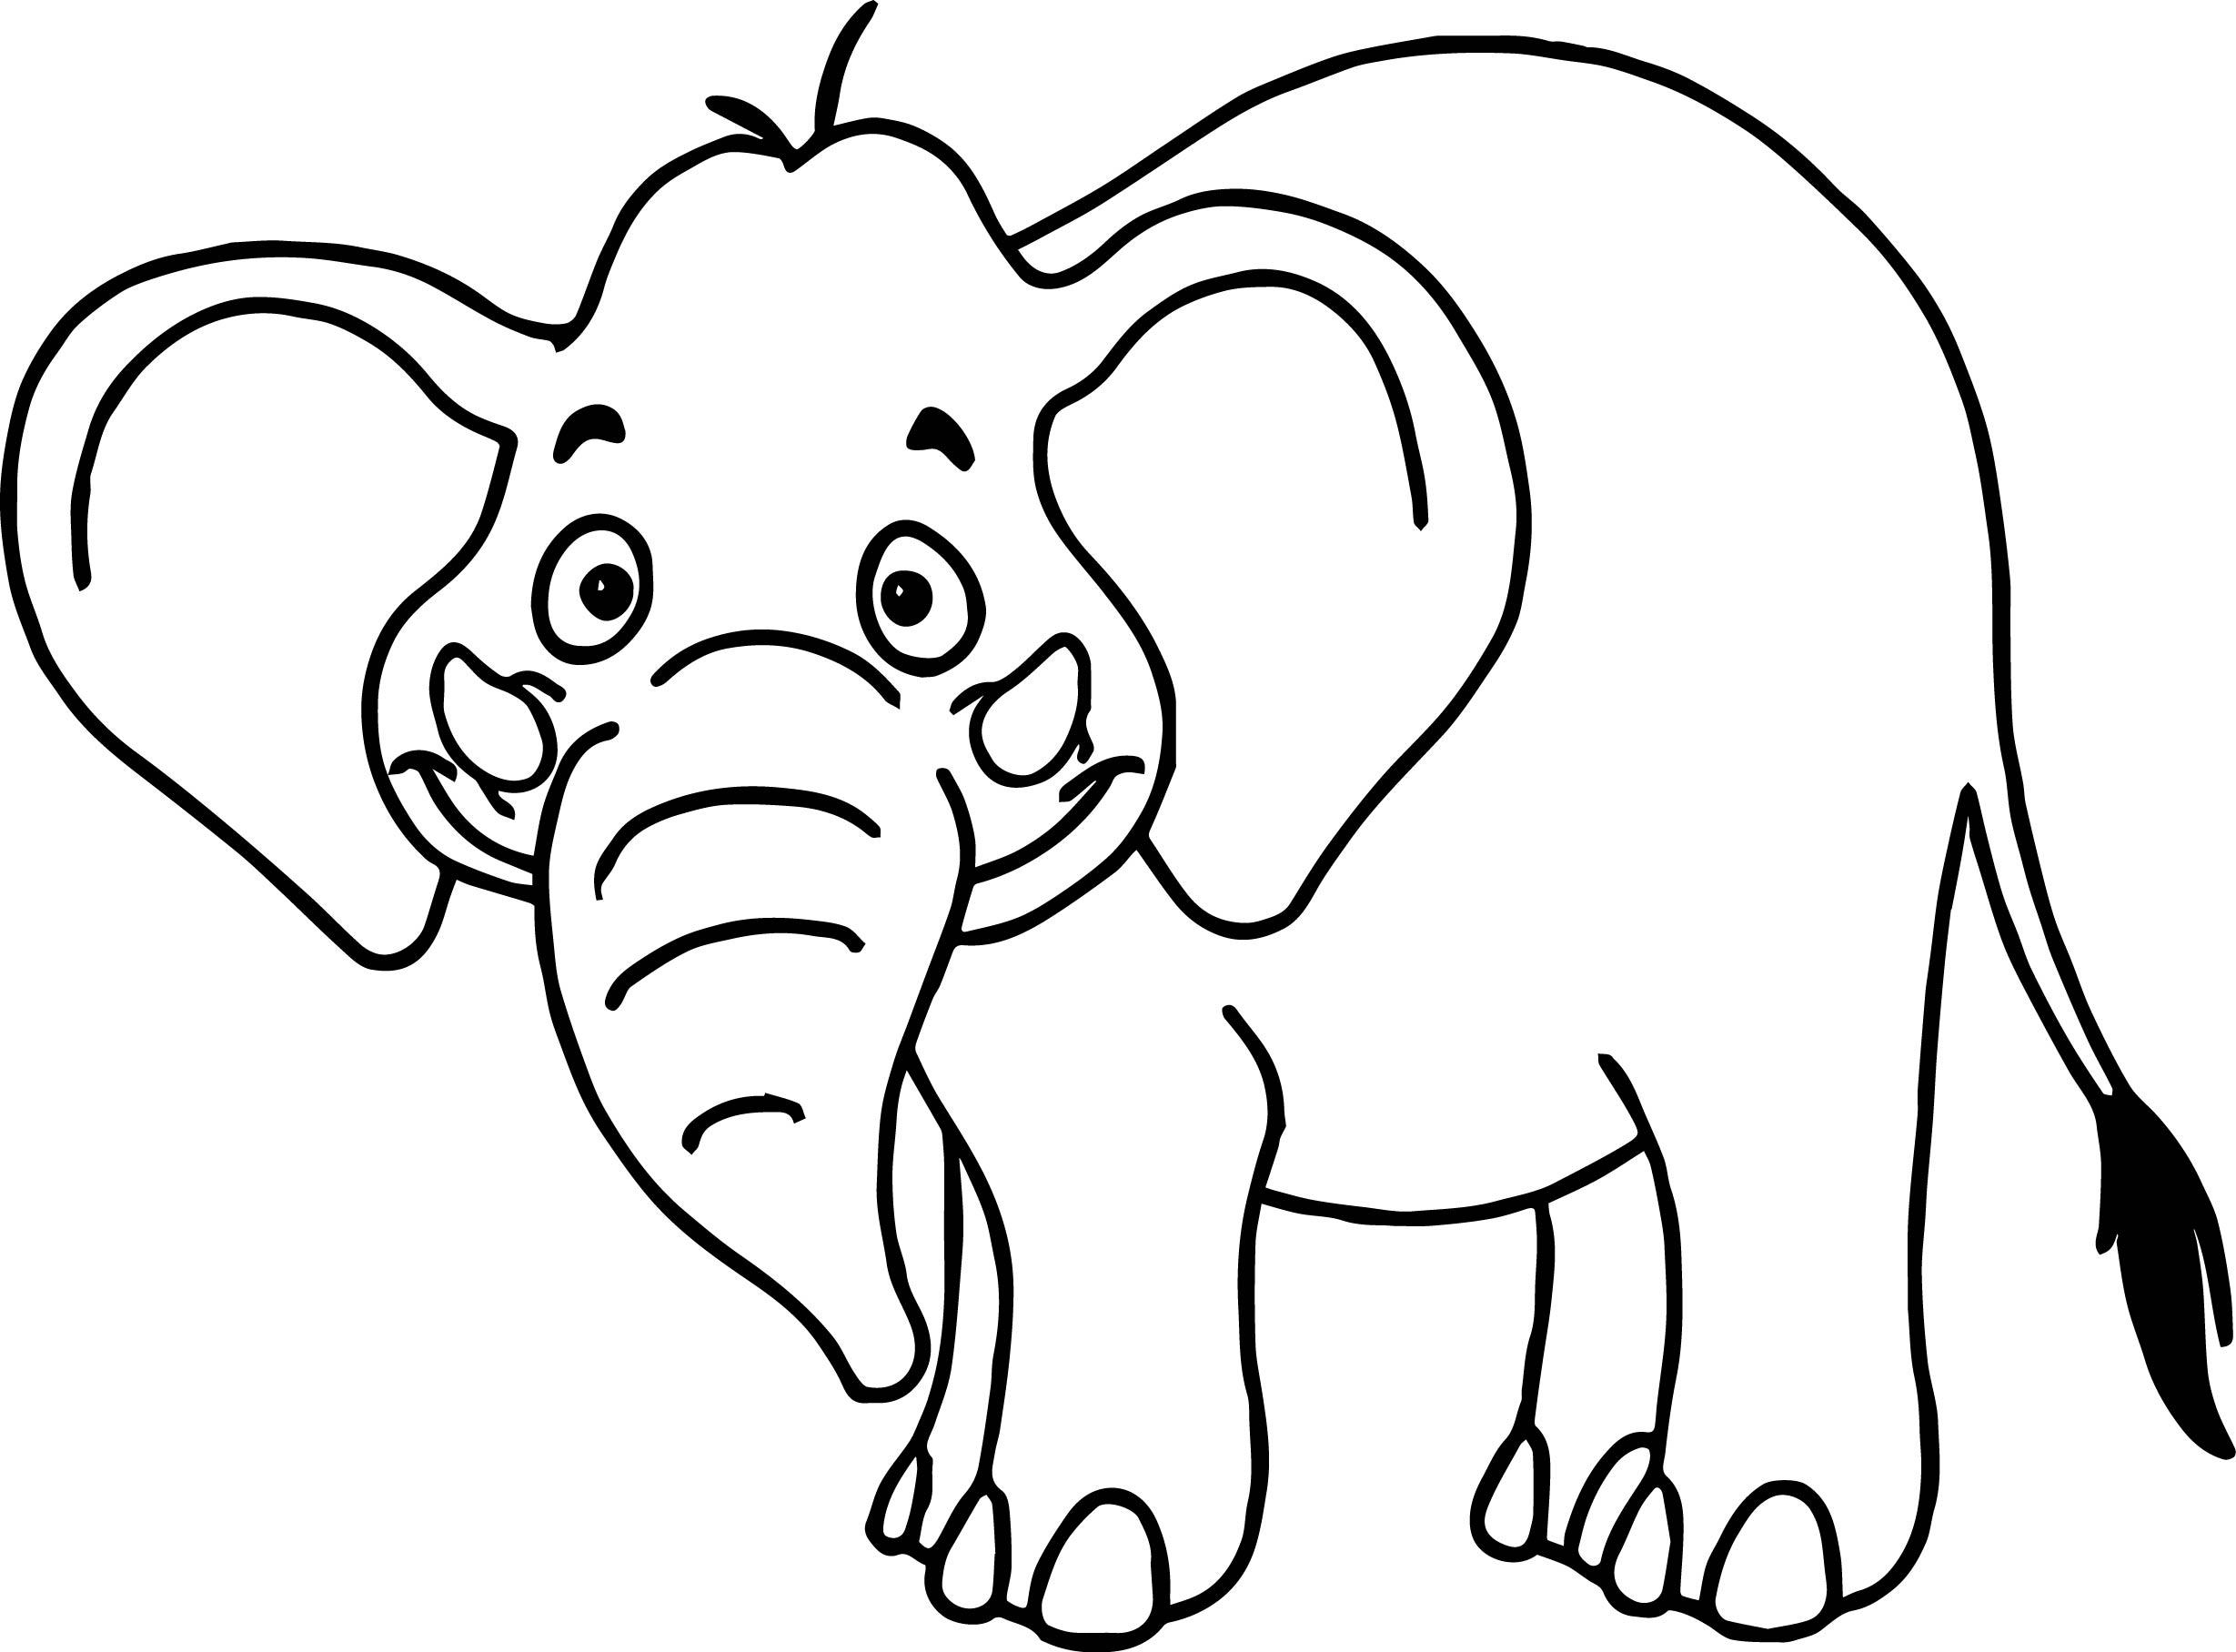 Elephant Cartoon Drawing At Getdrawings